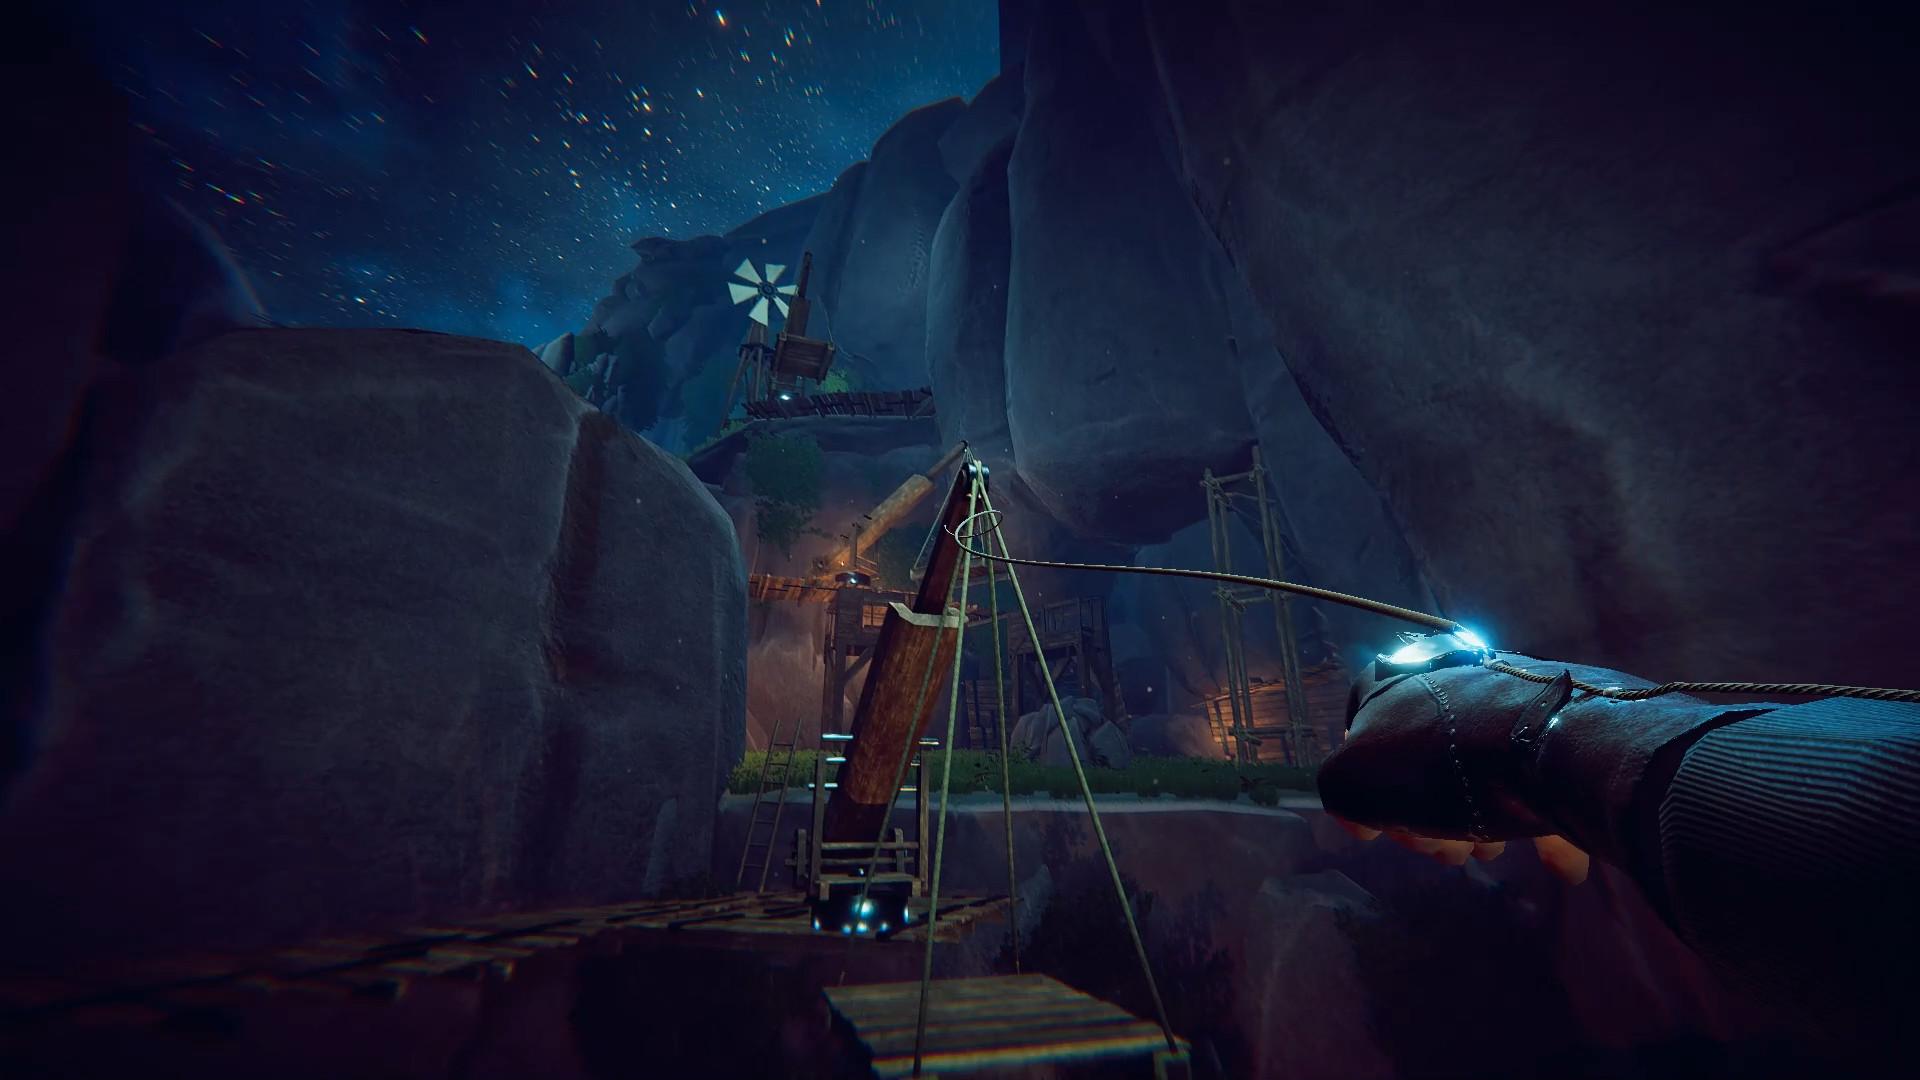 В Steam вышел приключенческий платформер про шахтера-раба — The Free Ones